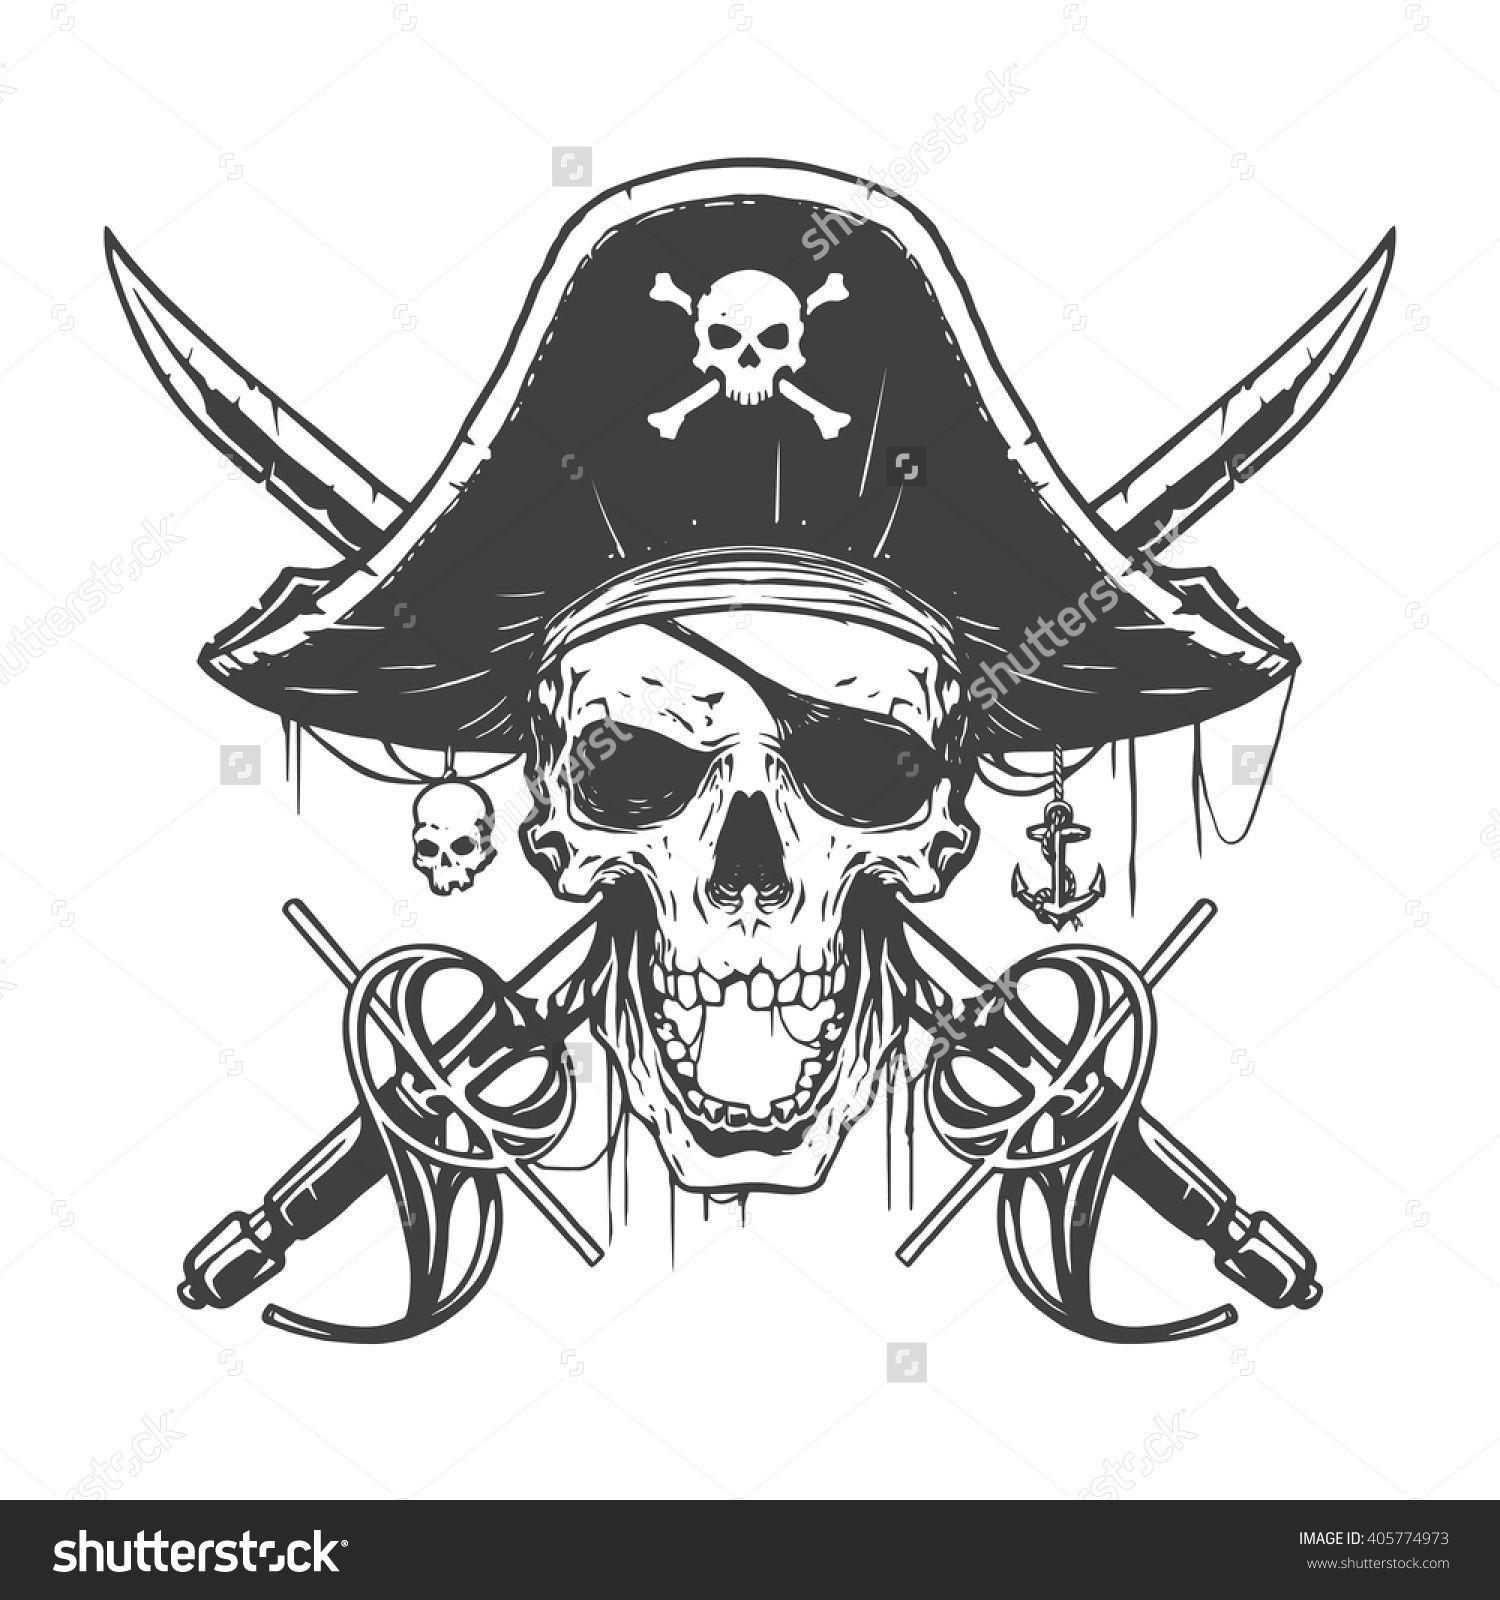 skull pirate illustration vectores pinterest pirate illustration illustrations and tattoo. Black Bedroom Furniture Sets. Home Design Ideas